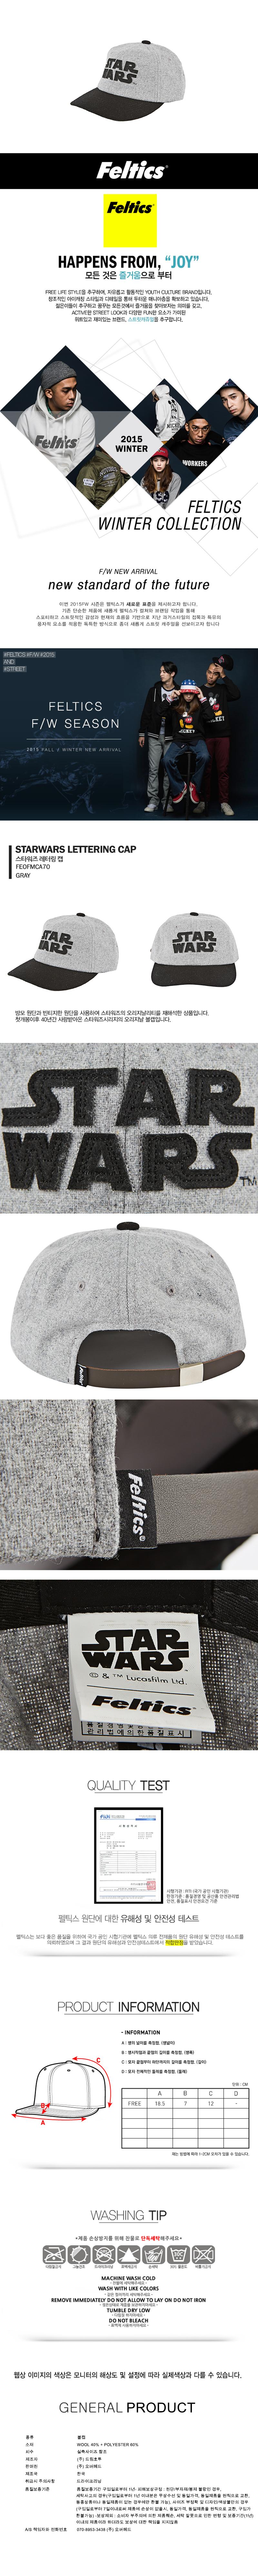 [ FELTICS ] [FELTICS] Starwars Lettering Ballcap GR/BK (FEOFMCA70)